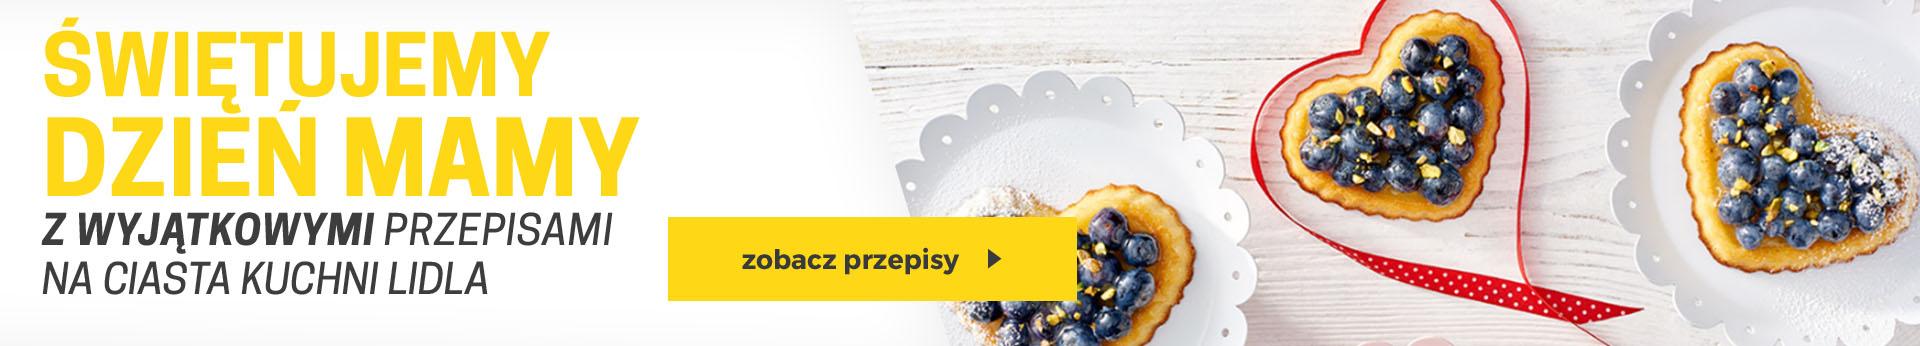 Kuchnia Lidla Kucharze